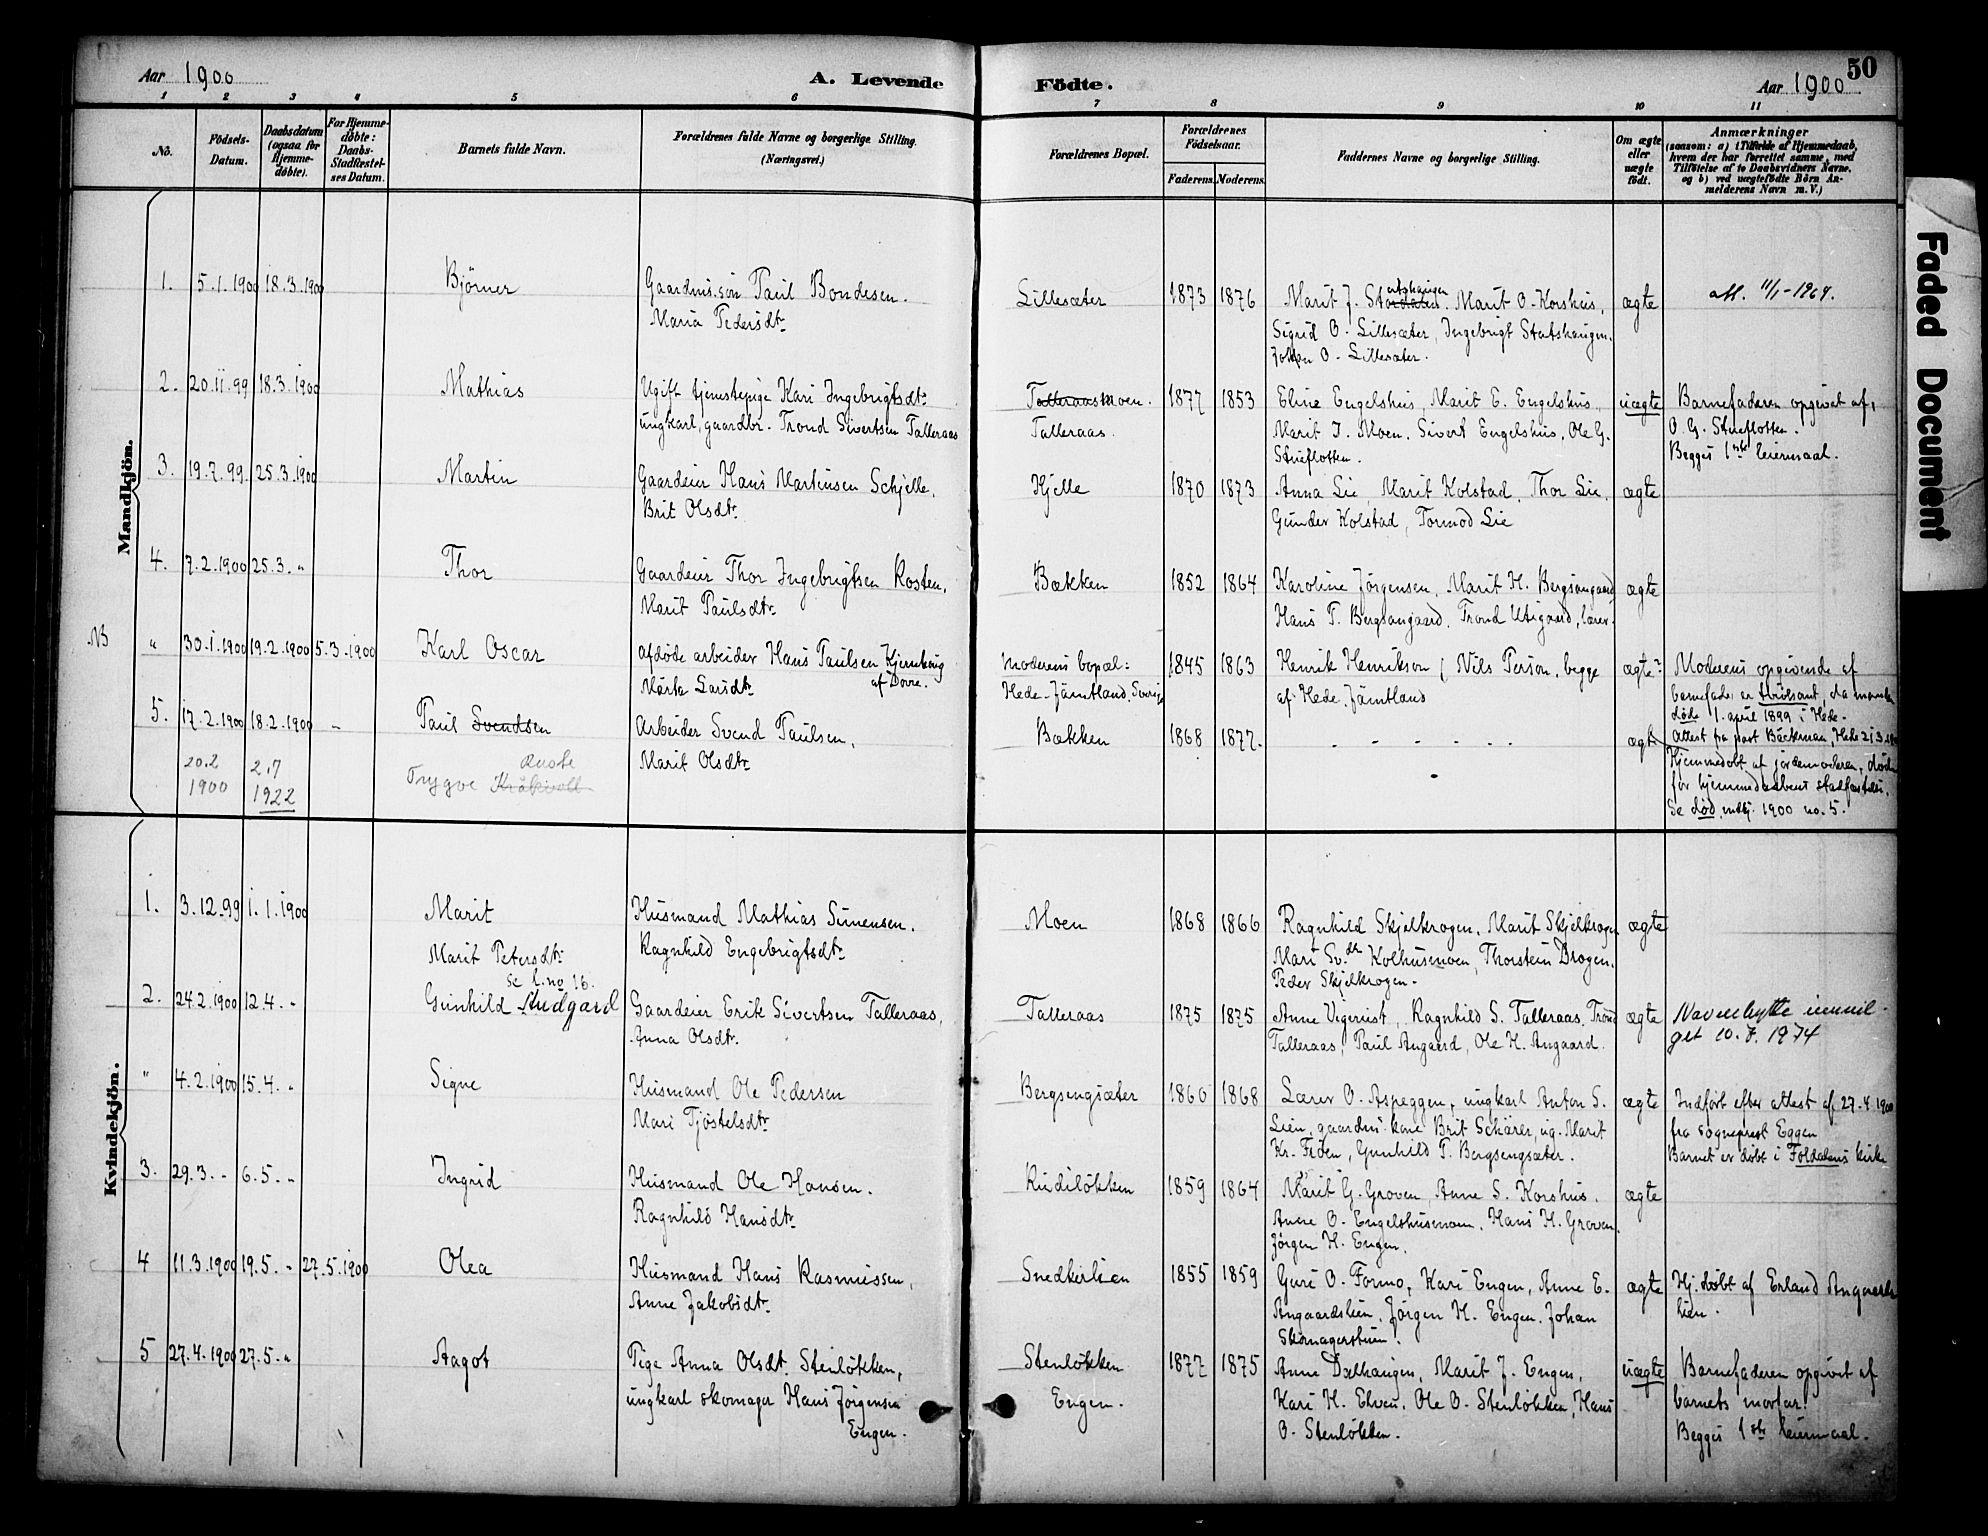 SAH, Dovre prestekontor, Ministerialbok nr. 3, 1891-1901, s. 50